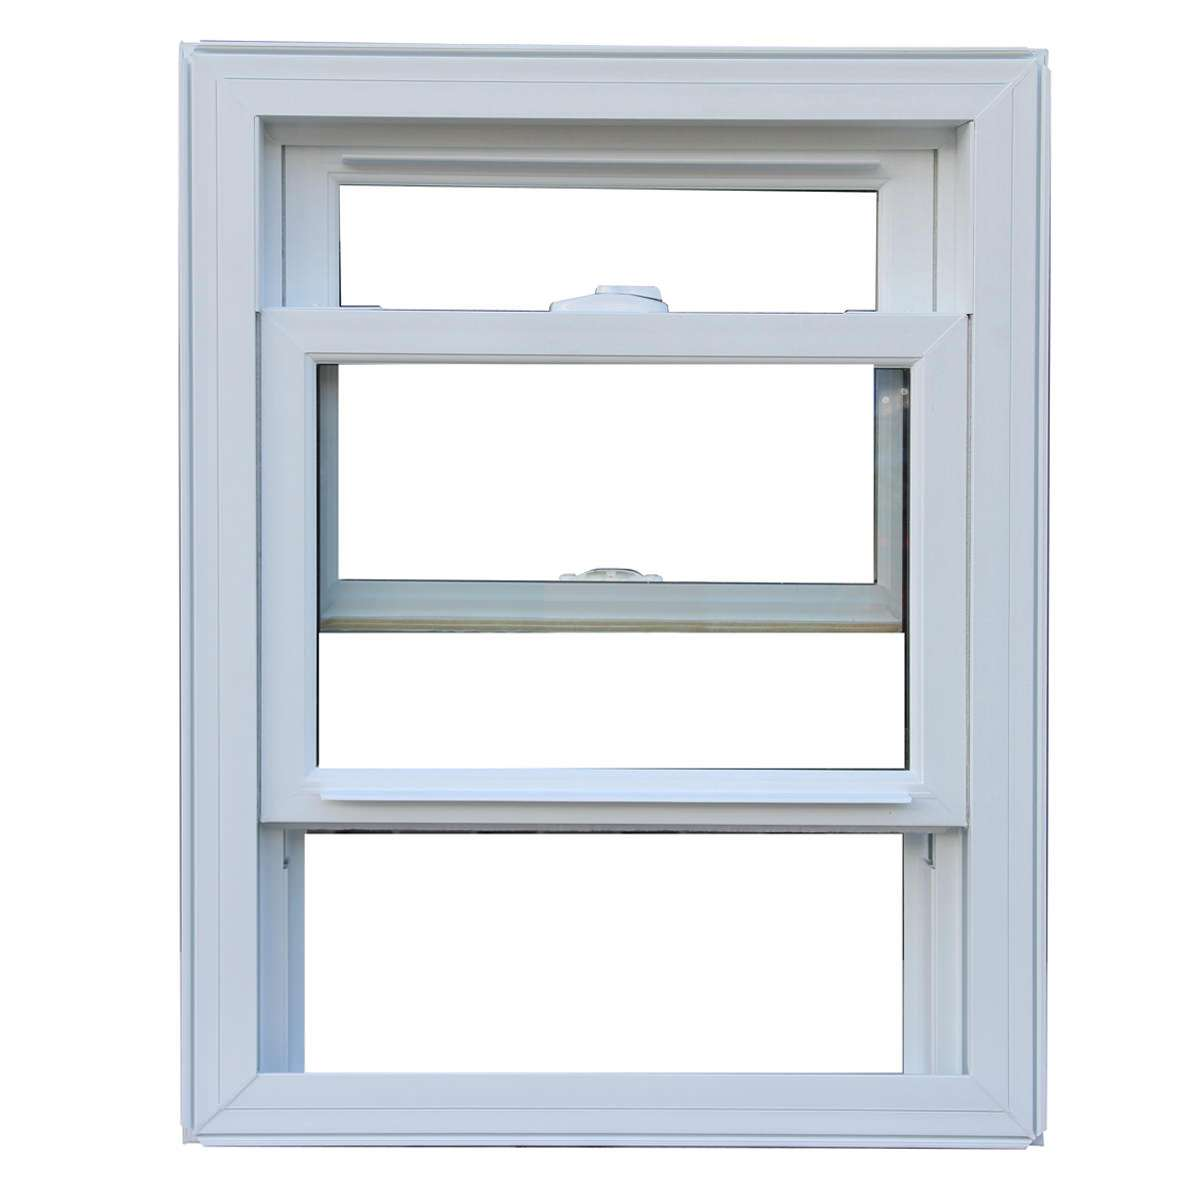 Open white Alumybrid hung window